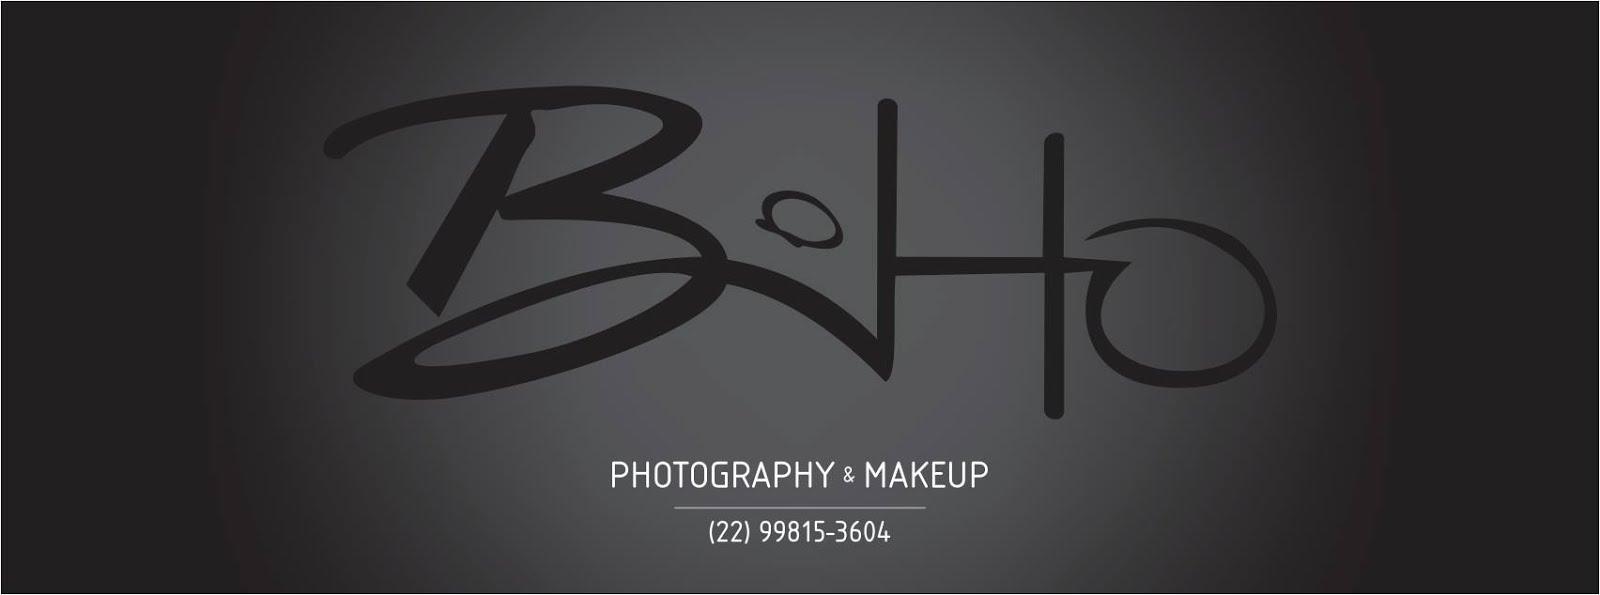 Binho Dutra Photography